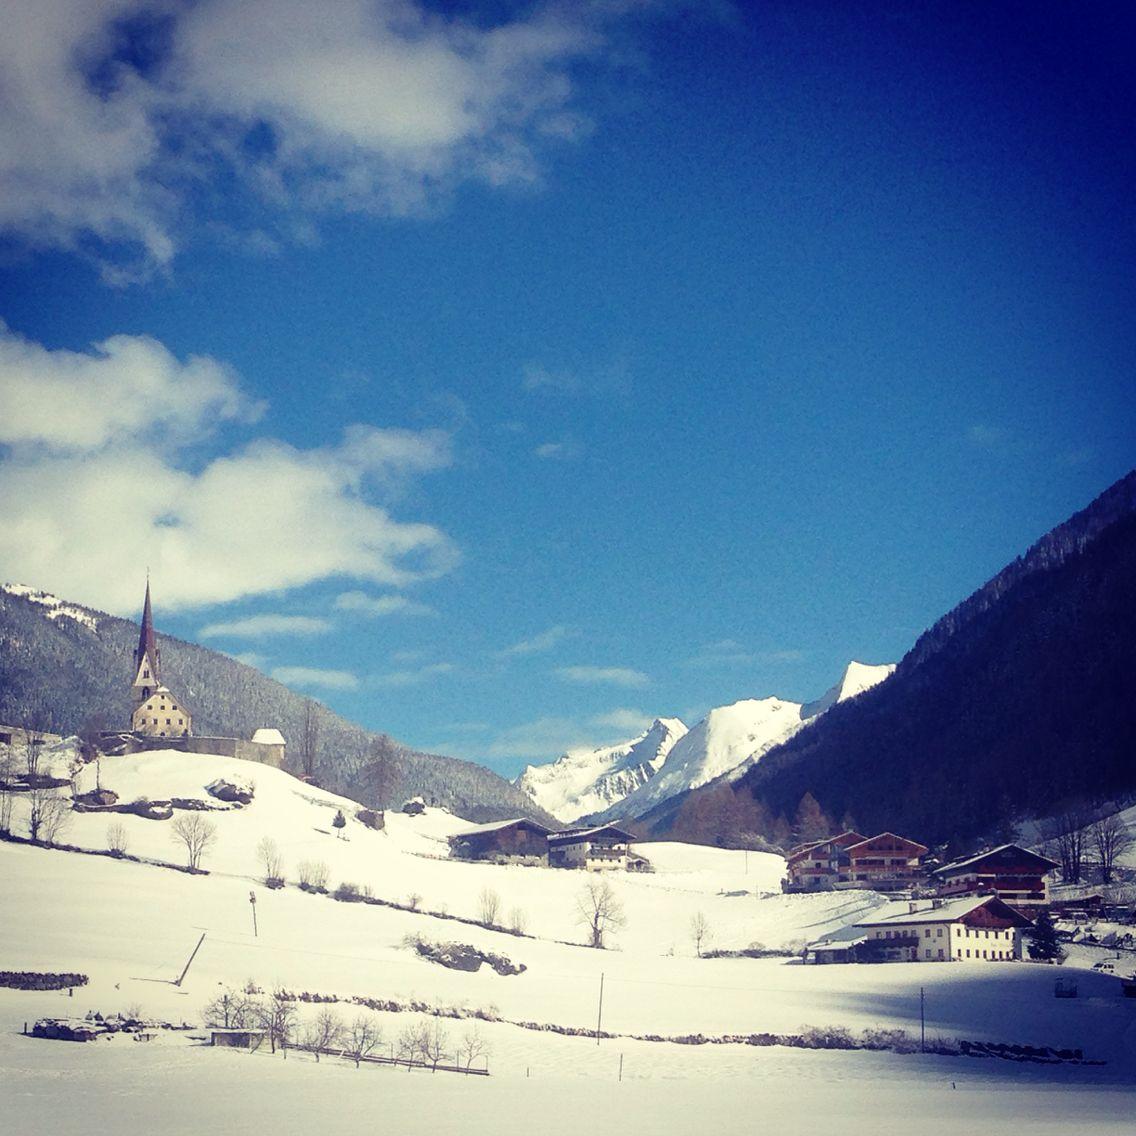 #winterwonderland #ahrntal